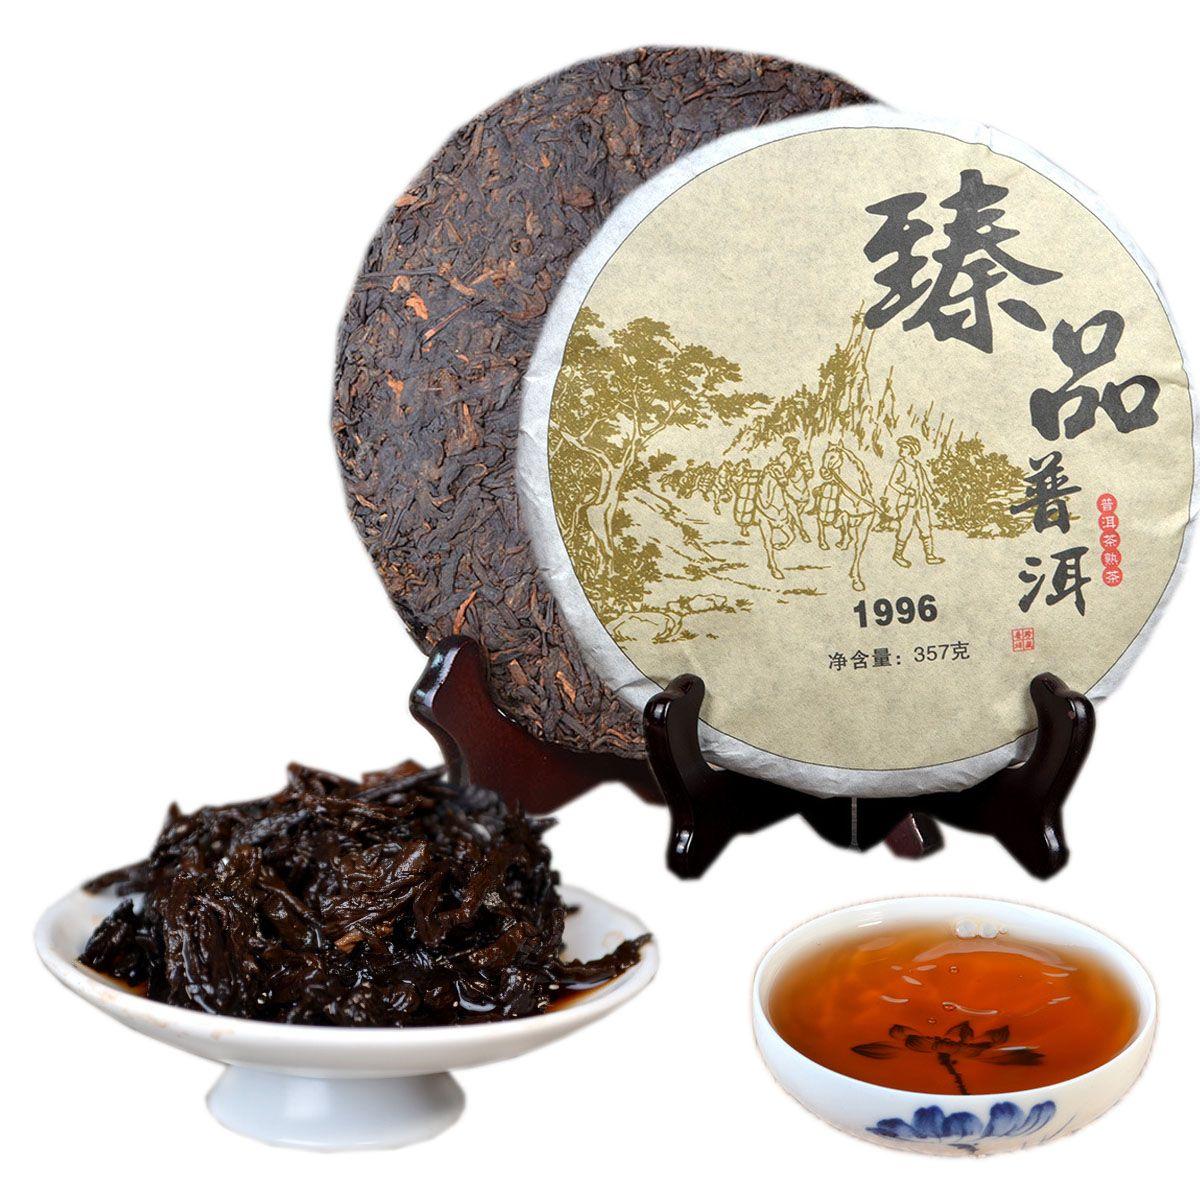 357g Ripe Puer Tea Yunnan Treasure Zhenpin Puer Tea Organic Pu'er Oldest Tree Cooked Puer Natural Puerh Black Puerh Tea Cake